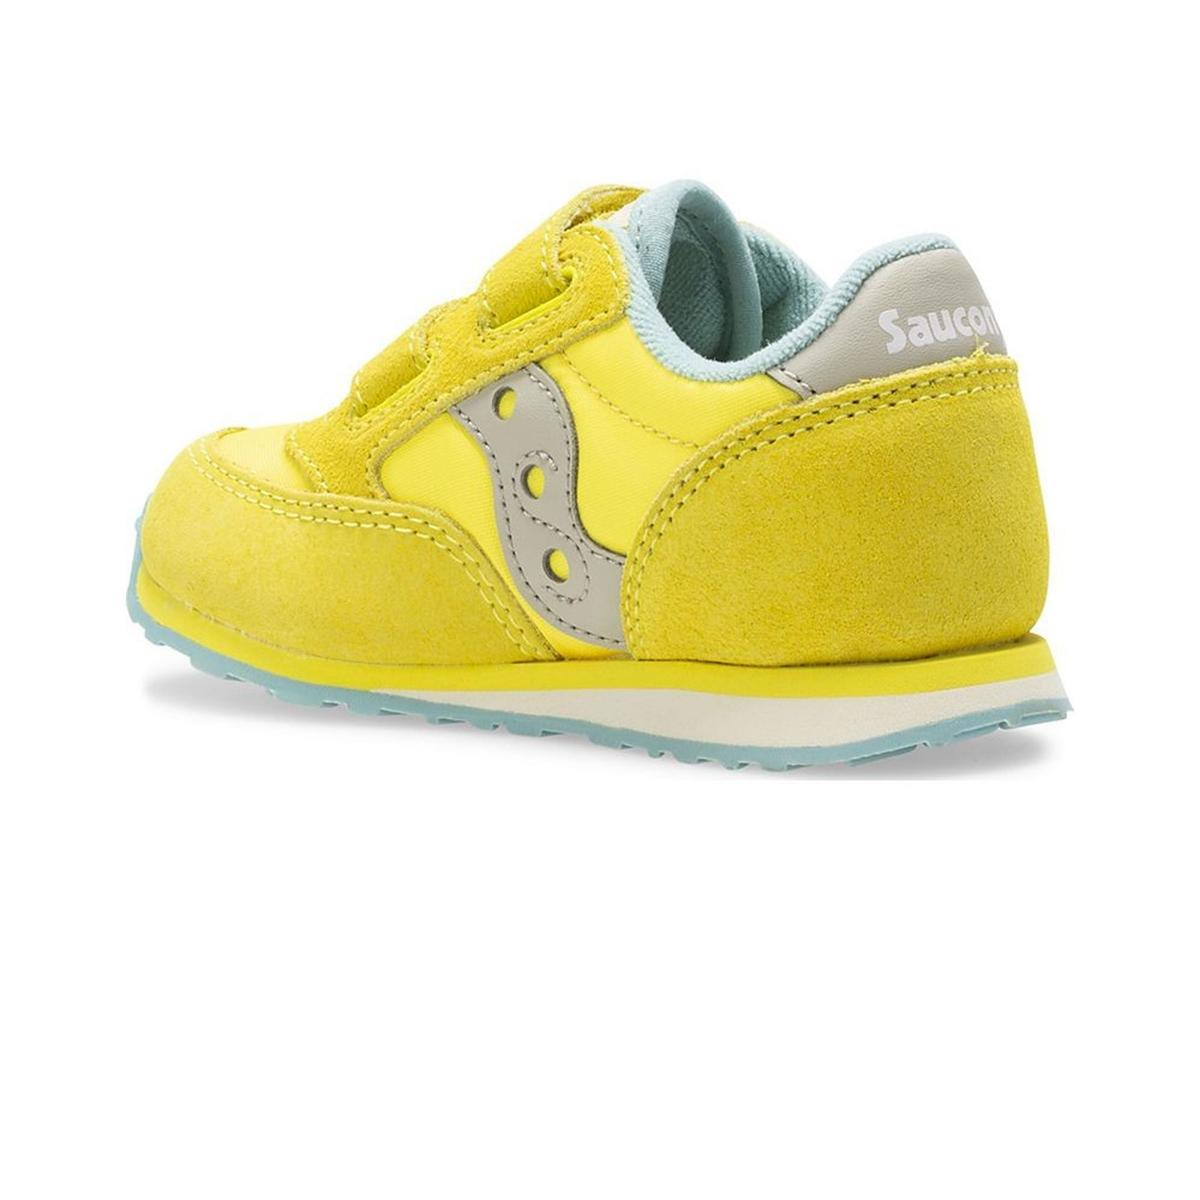 Scarpe Sneakers Saucony Baby Jazz HL Yellow da bimbo rif. SL162936